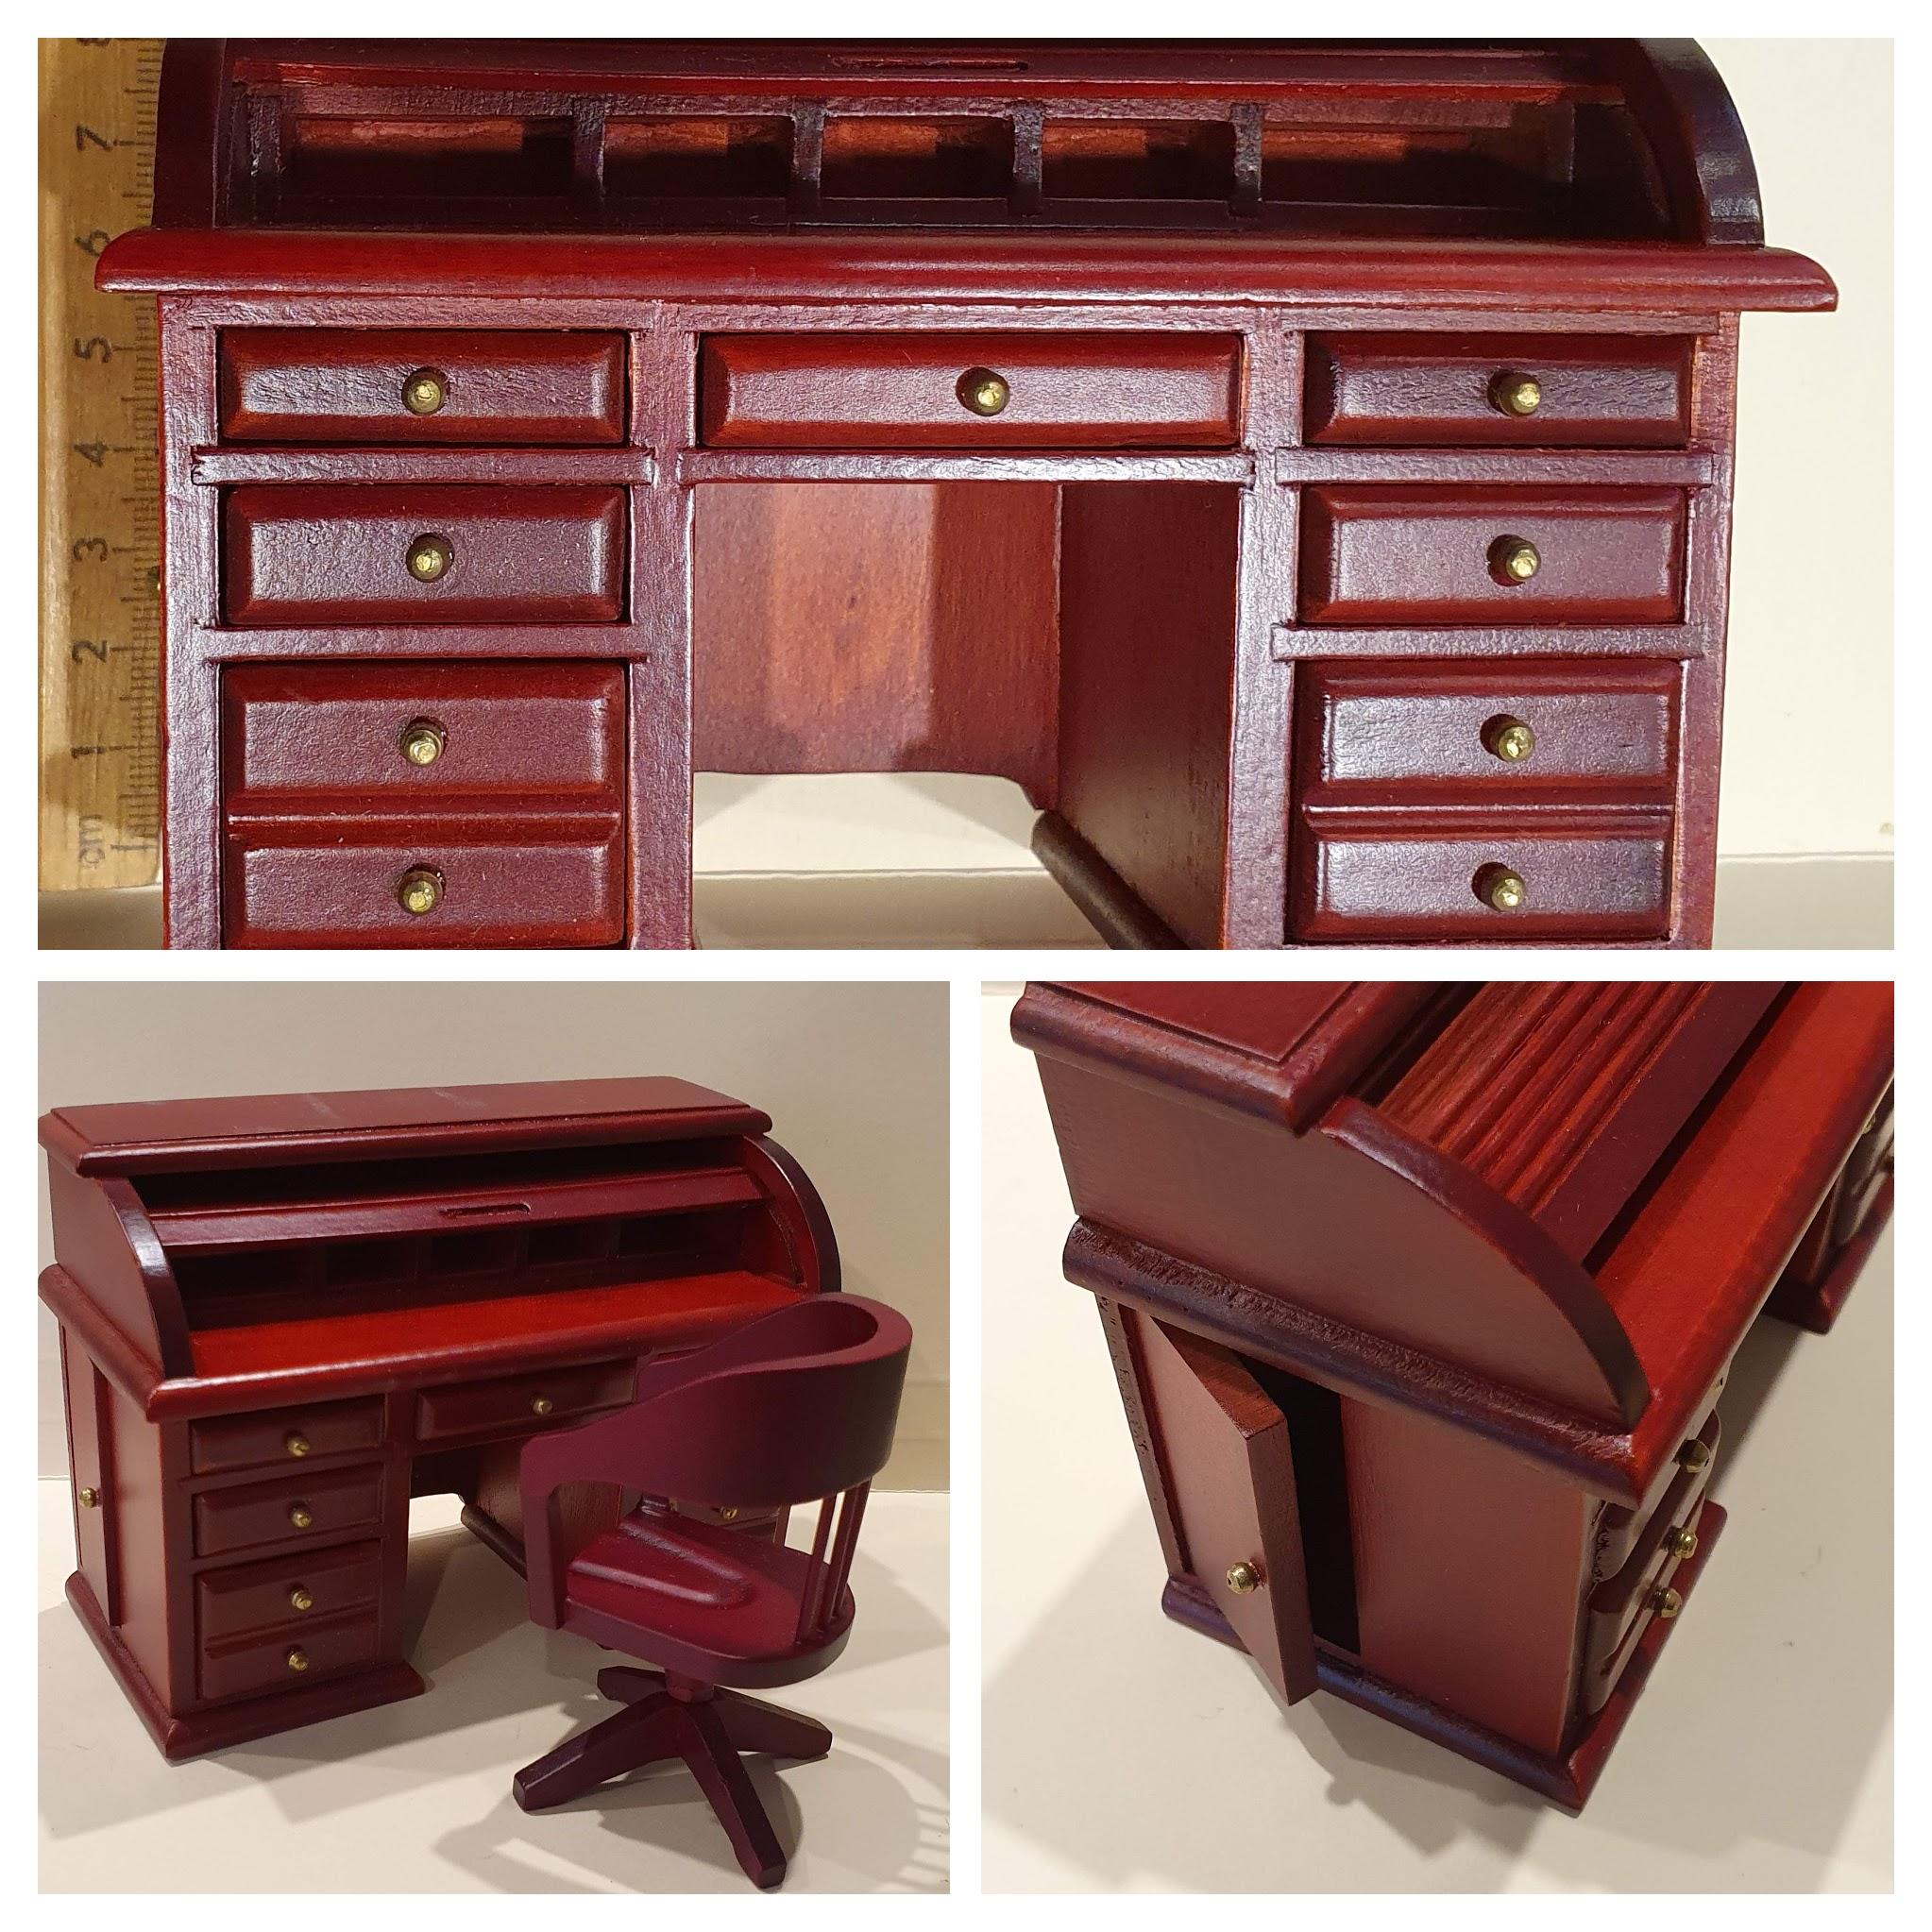 Rolltop Desk (MH) $32.50